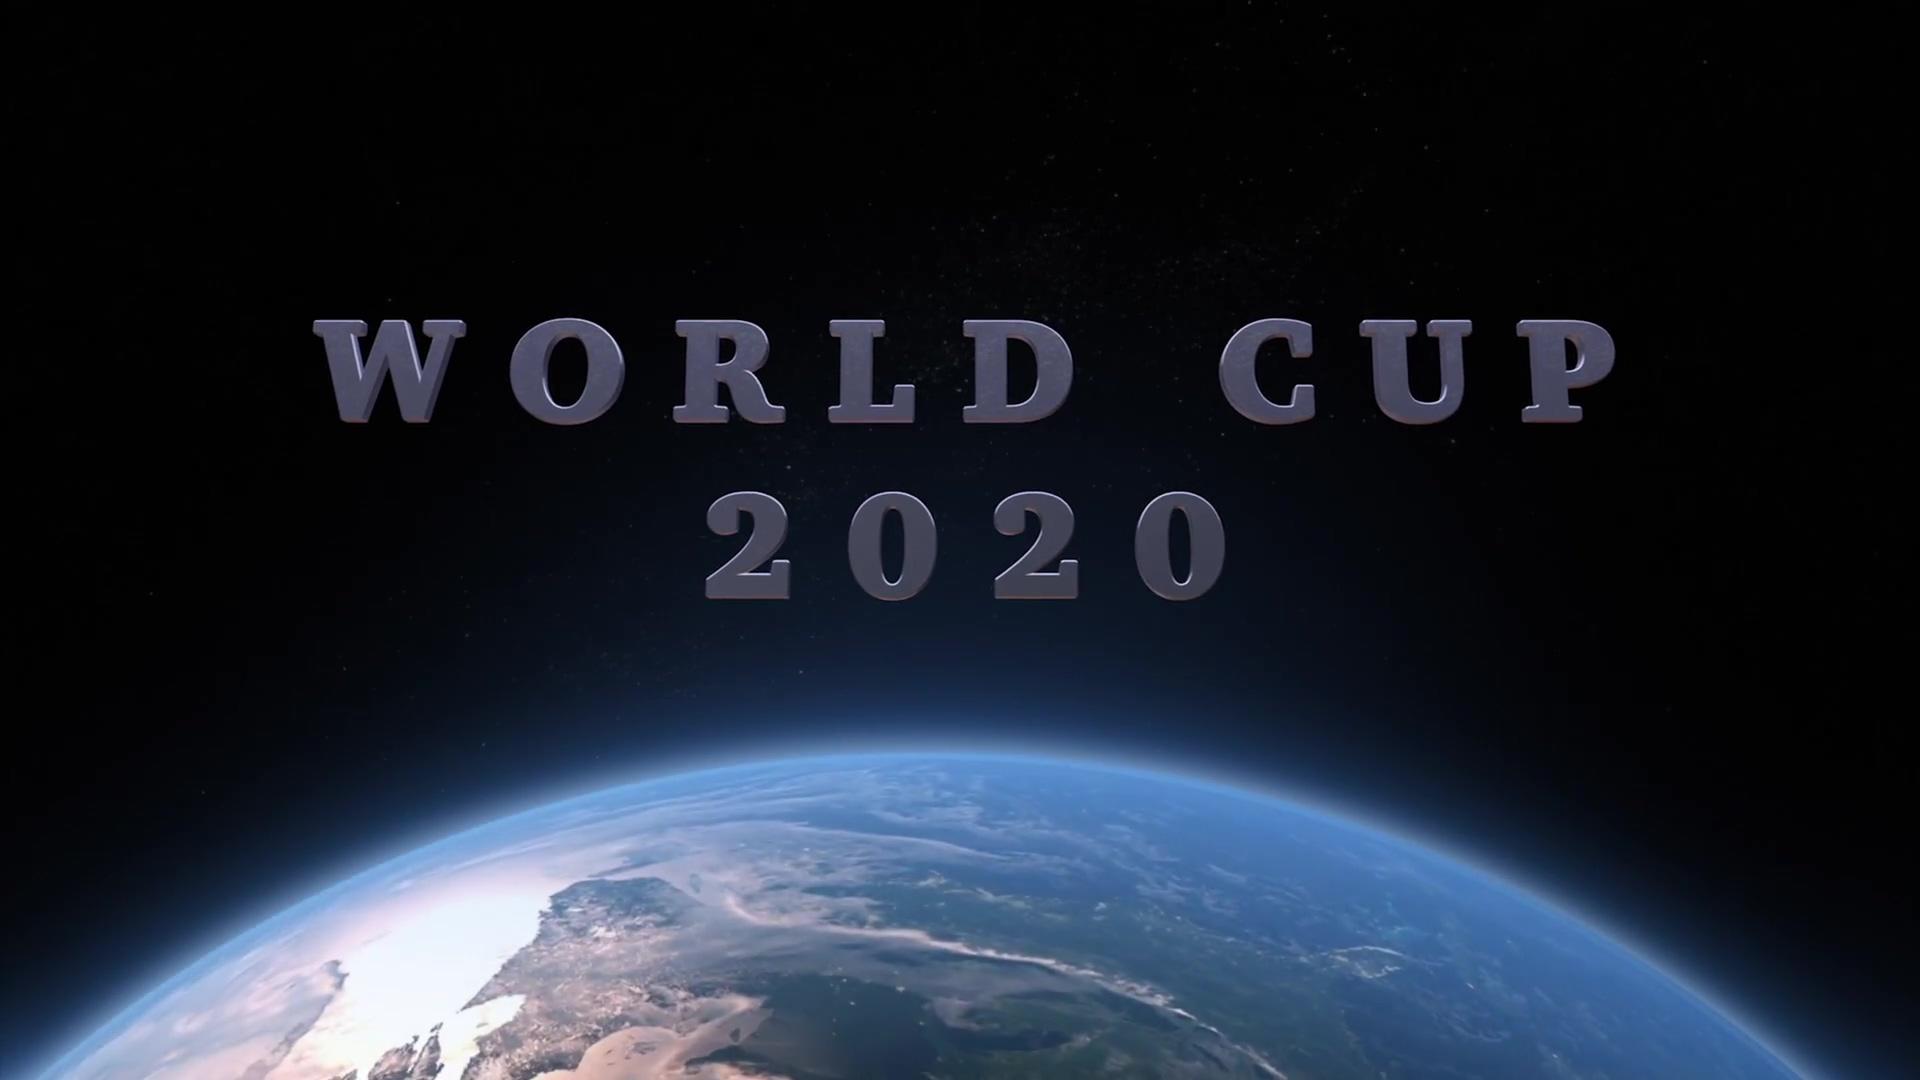 UK&I World Cup Video v1 1080pHD.mov (1)